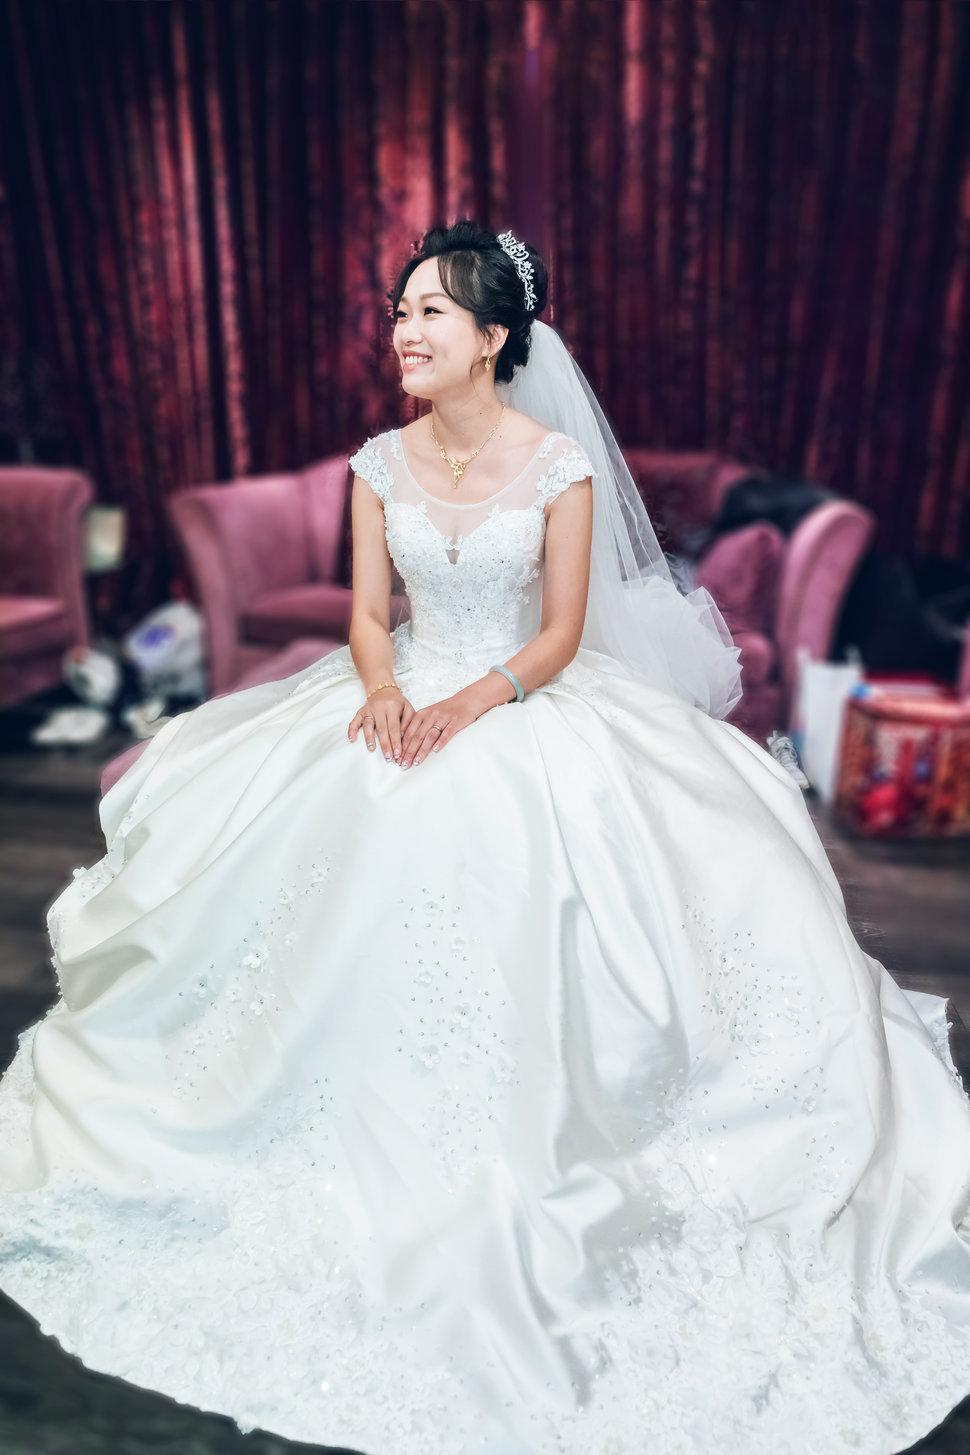 5D4_0323 - Promaker婚禮紀錄攝影團隊婚攝豪哥《結婚吧》